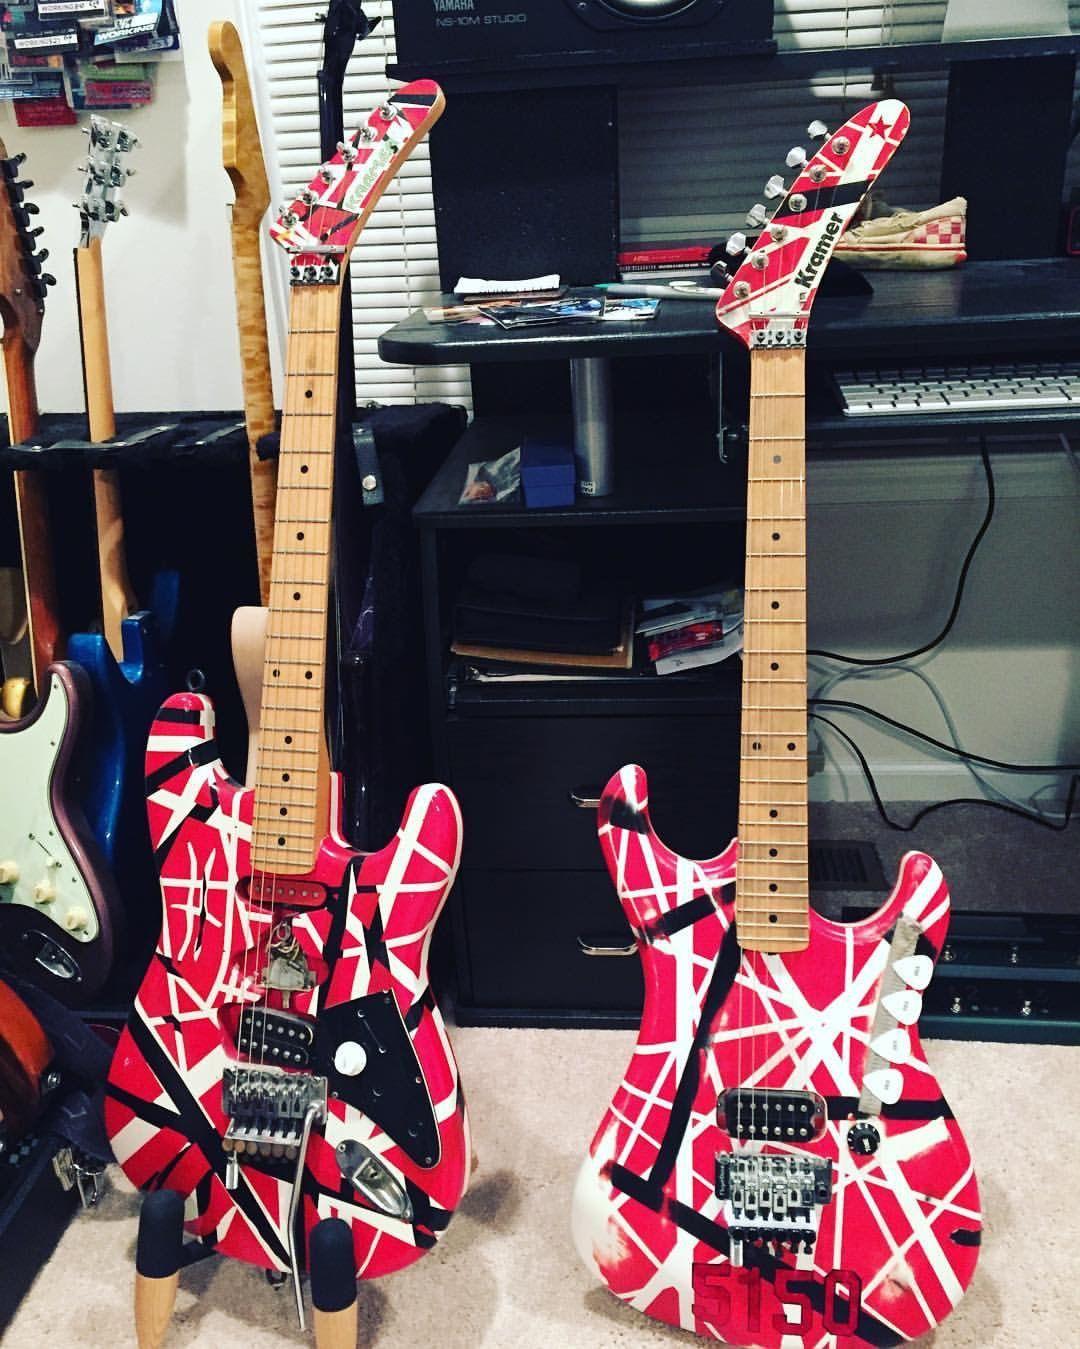 Pin By Kevin Doucette On Guitar Designs Guitar Artwork Cool Guitar Eddie Van Halen